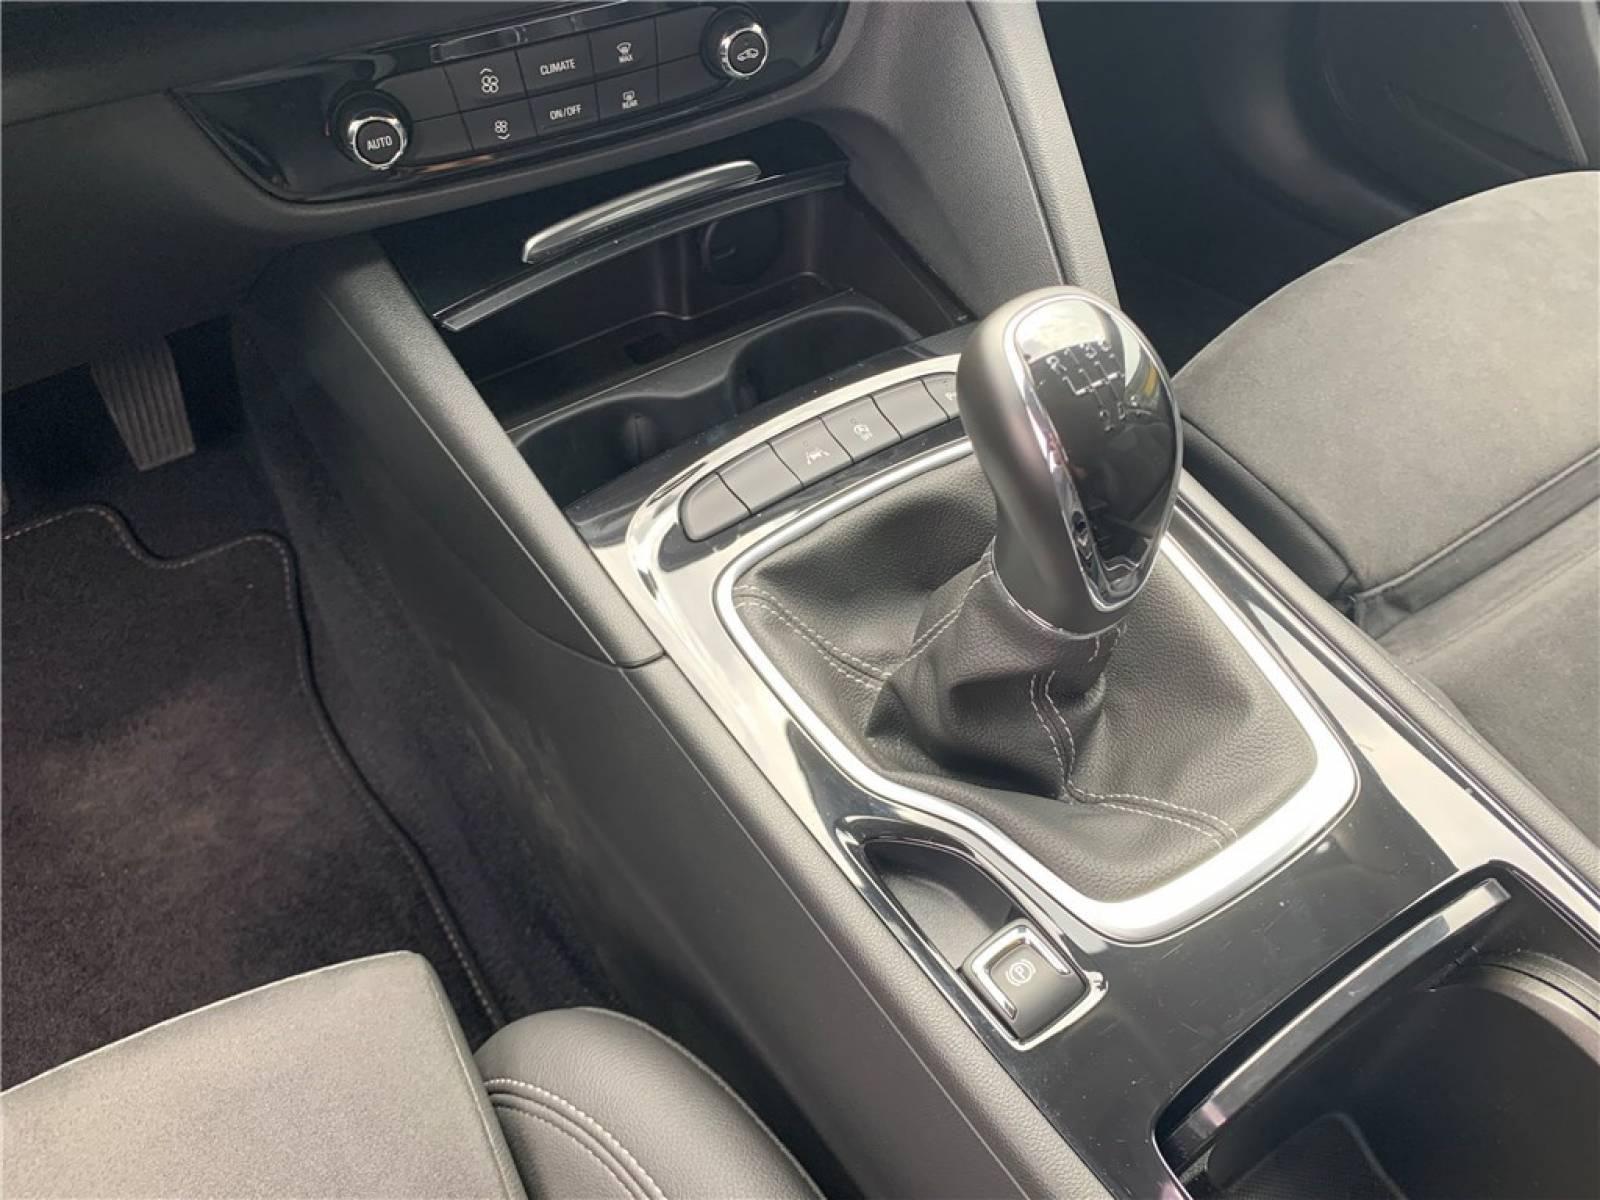 OPEL Insignia Grand Sport 1.6 Diesel 136 ch - véhicule d'occasion - Groupe Guillet - Opel Magicauto - Montceau-les-Mines - 71300 - Montceau-les-Mines - 17